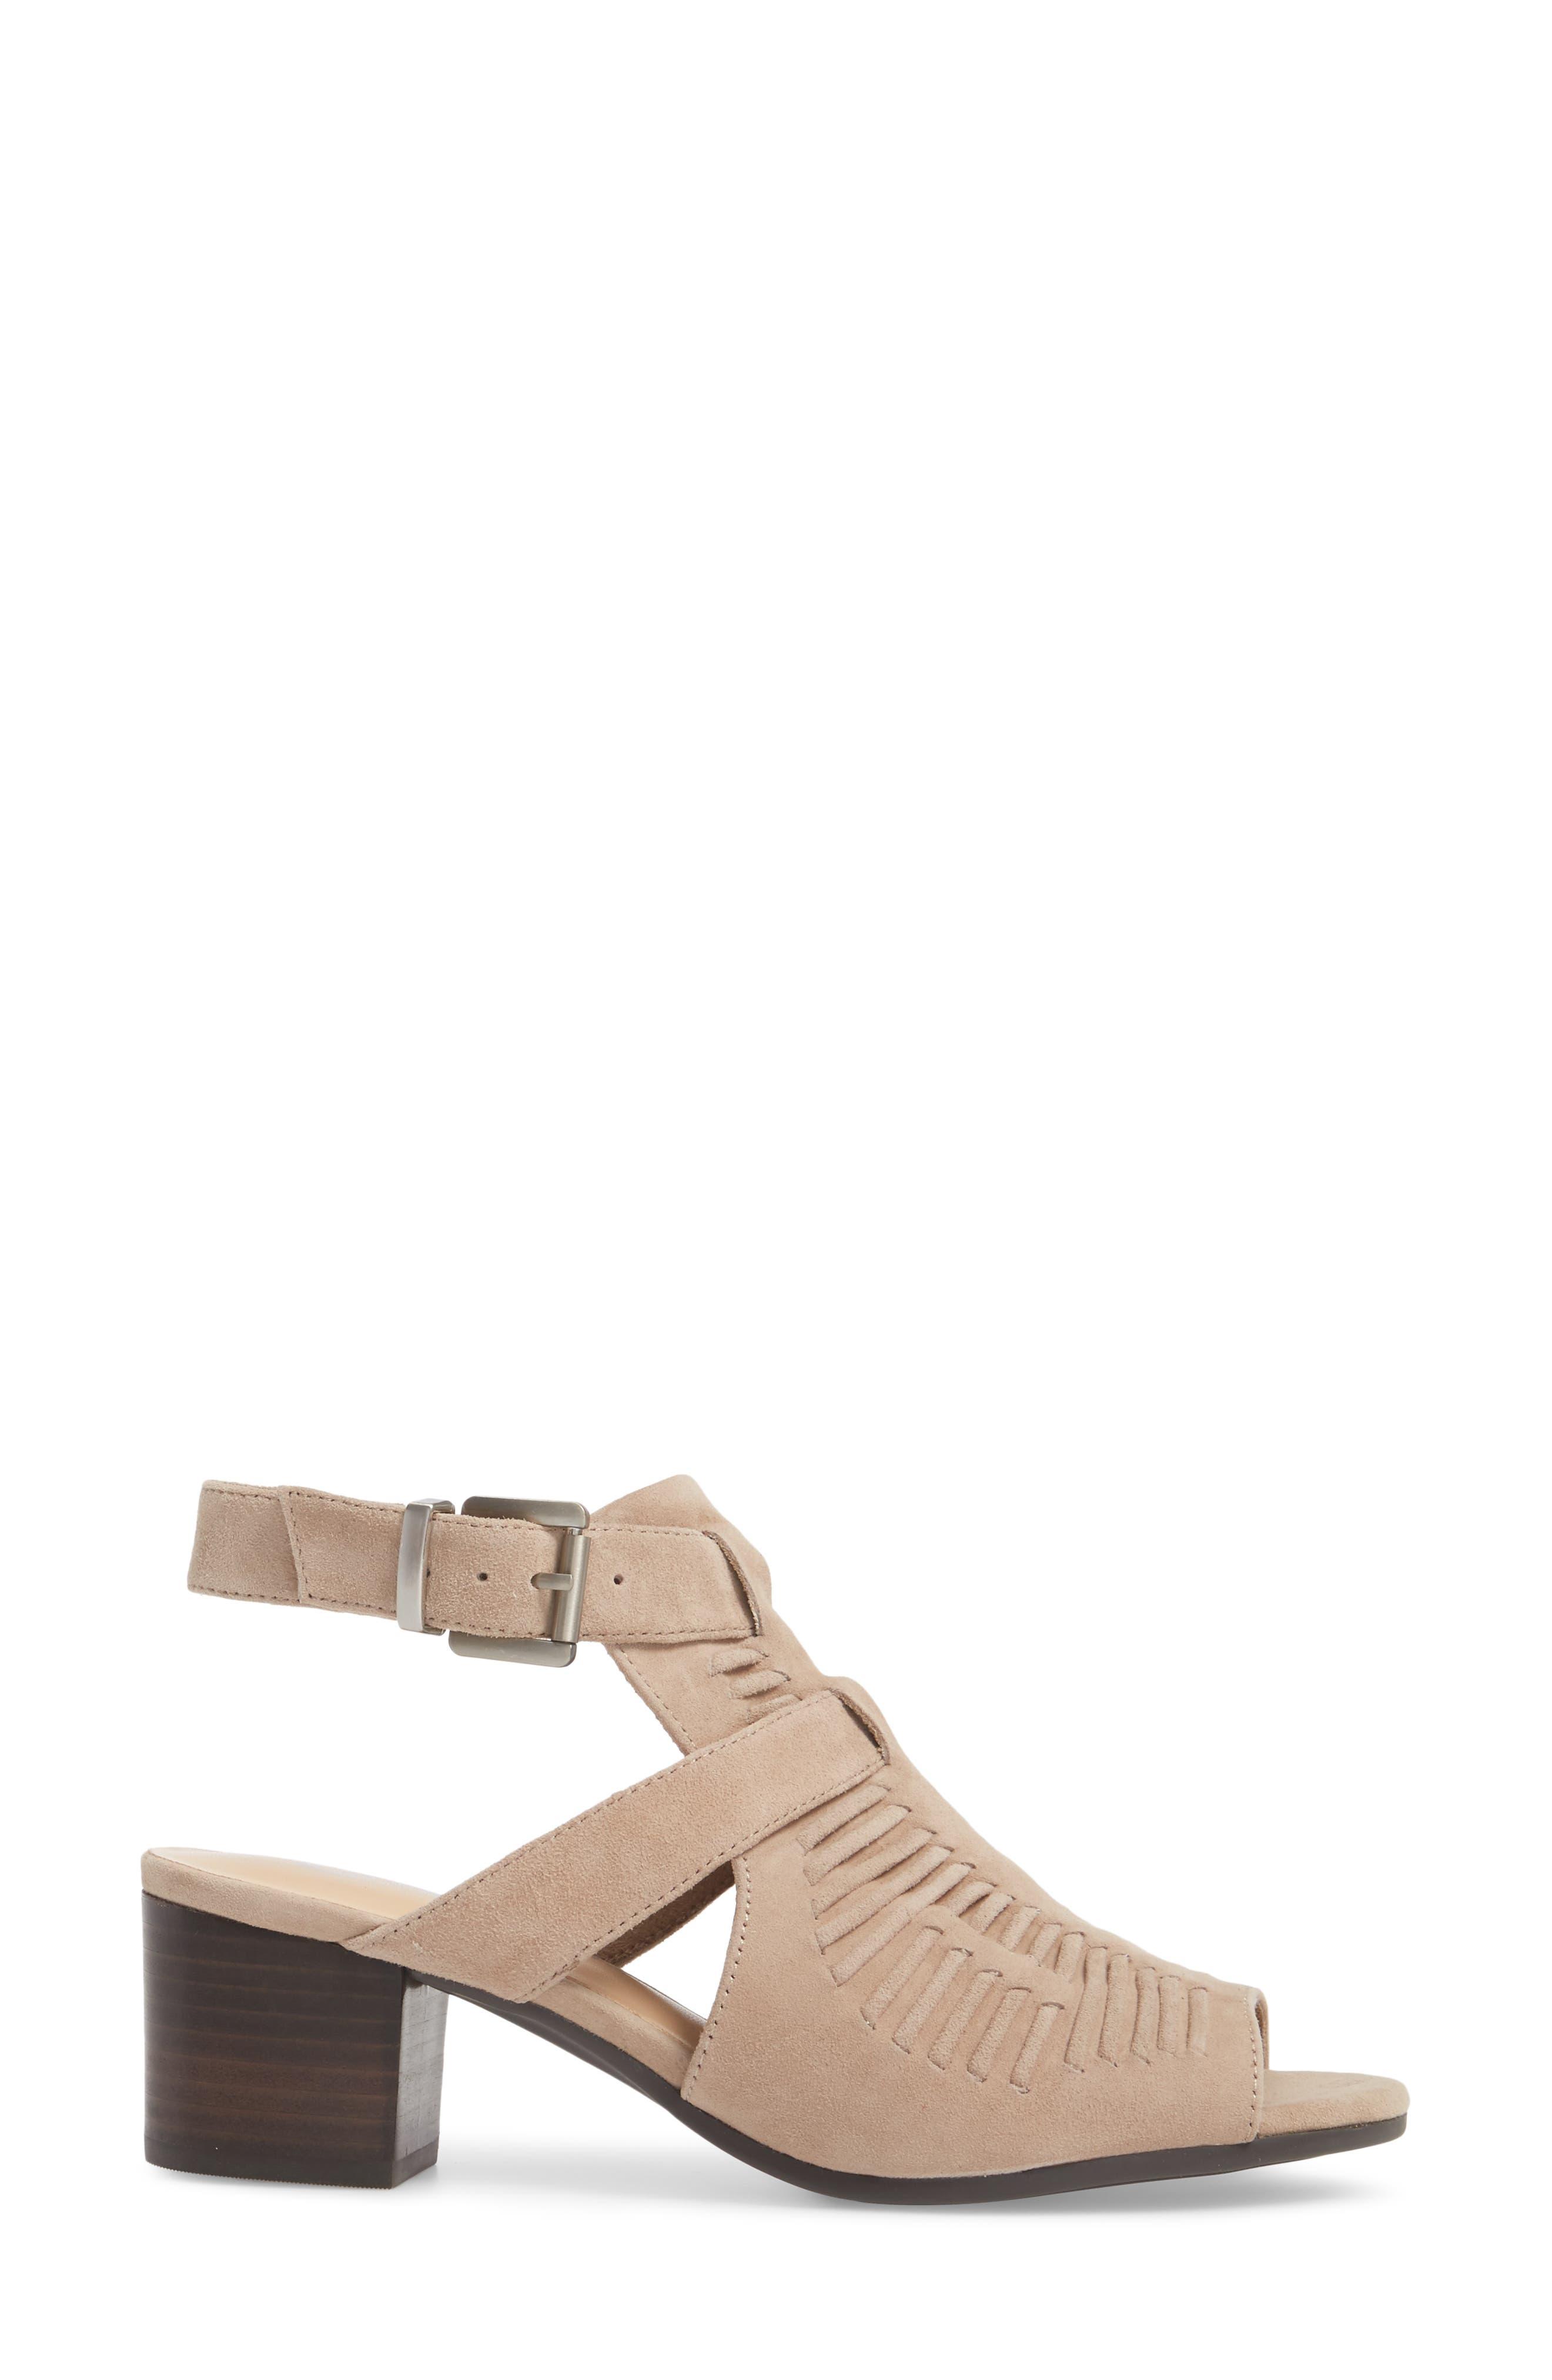 Finley Ankle Strap Sandal,                             Alternate thumbnail 14, color,